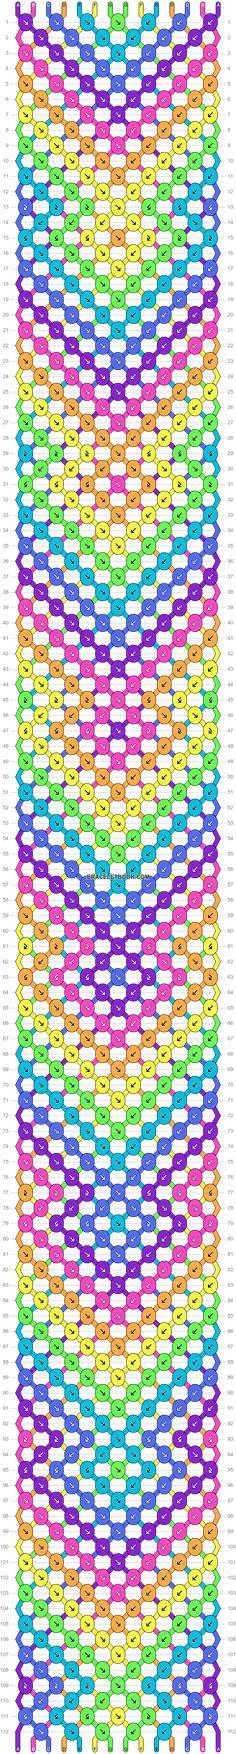 Normal pattern #34157 | BraceletBook